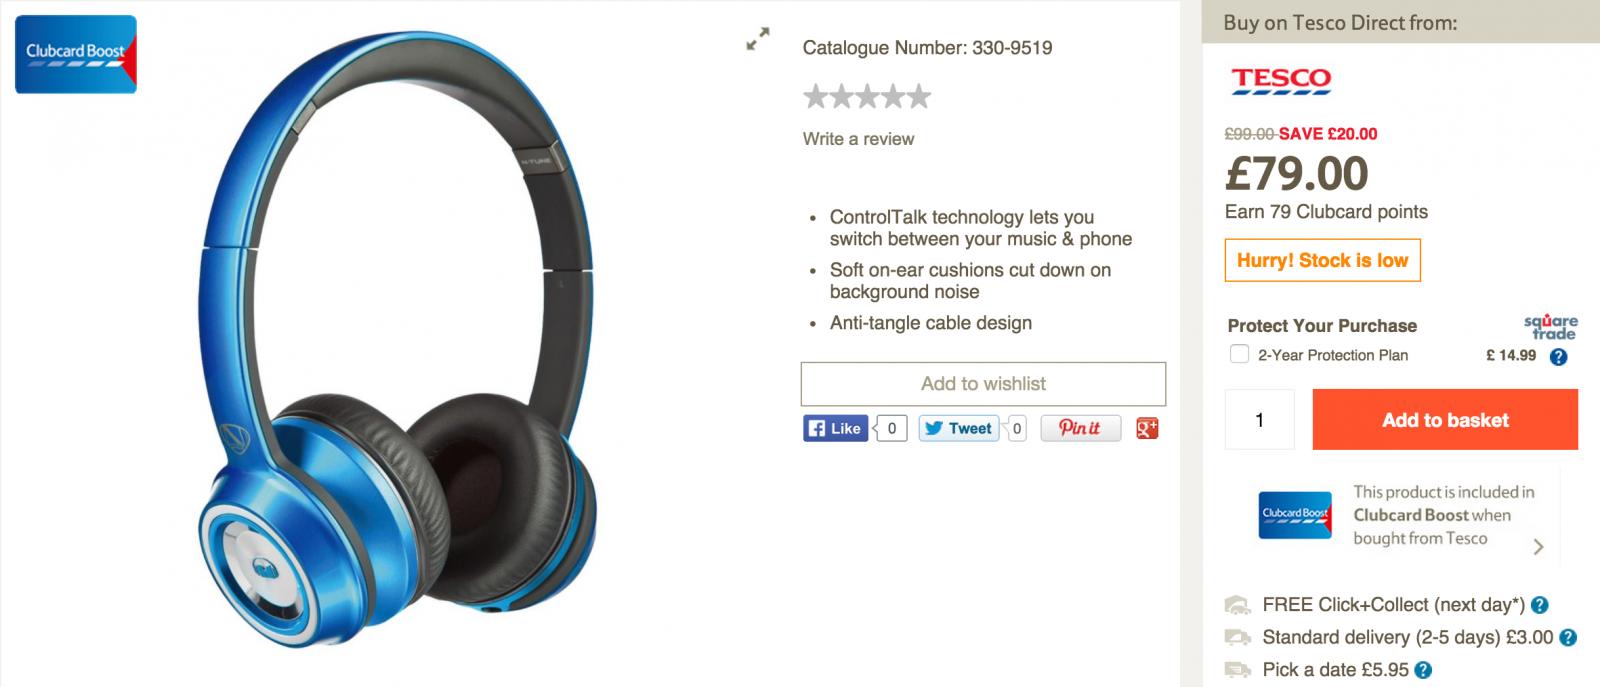 Tesco Black Friday Deals Announced Headphones